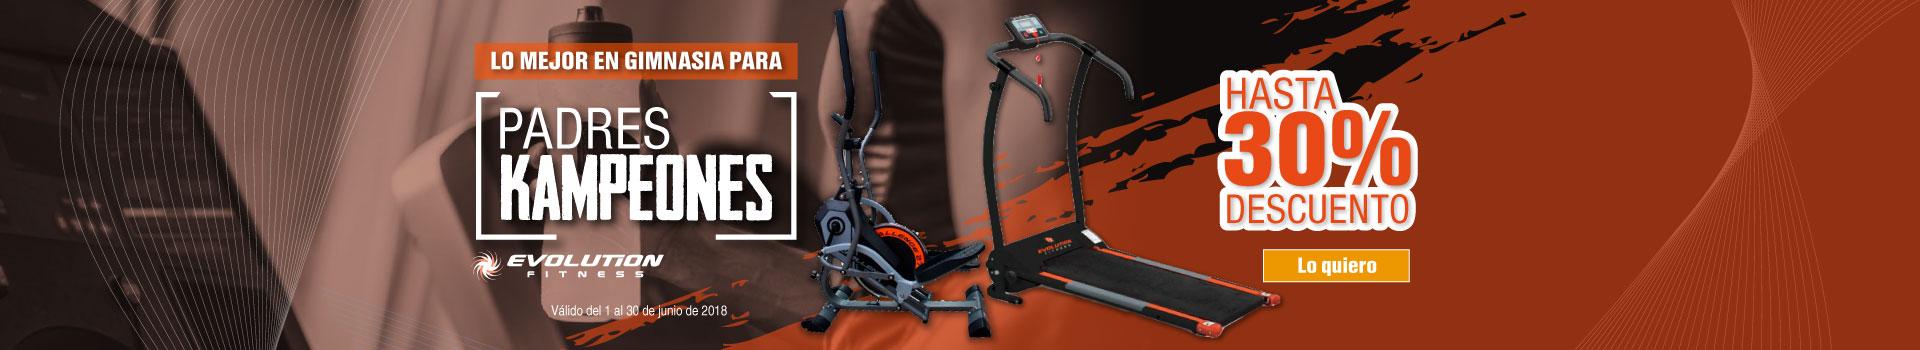 AK-KT-BCAT-1-Deportes-DCAT-Evolution-Hasta30dto-Jun16